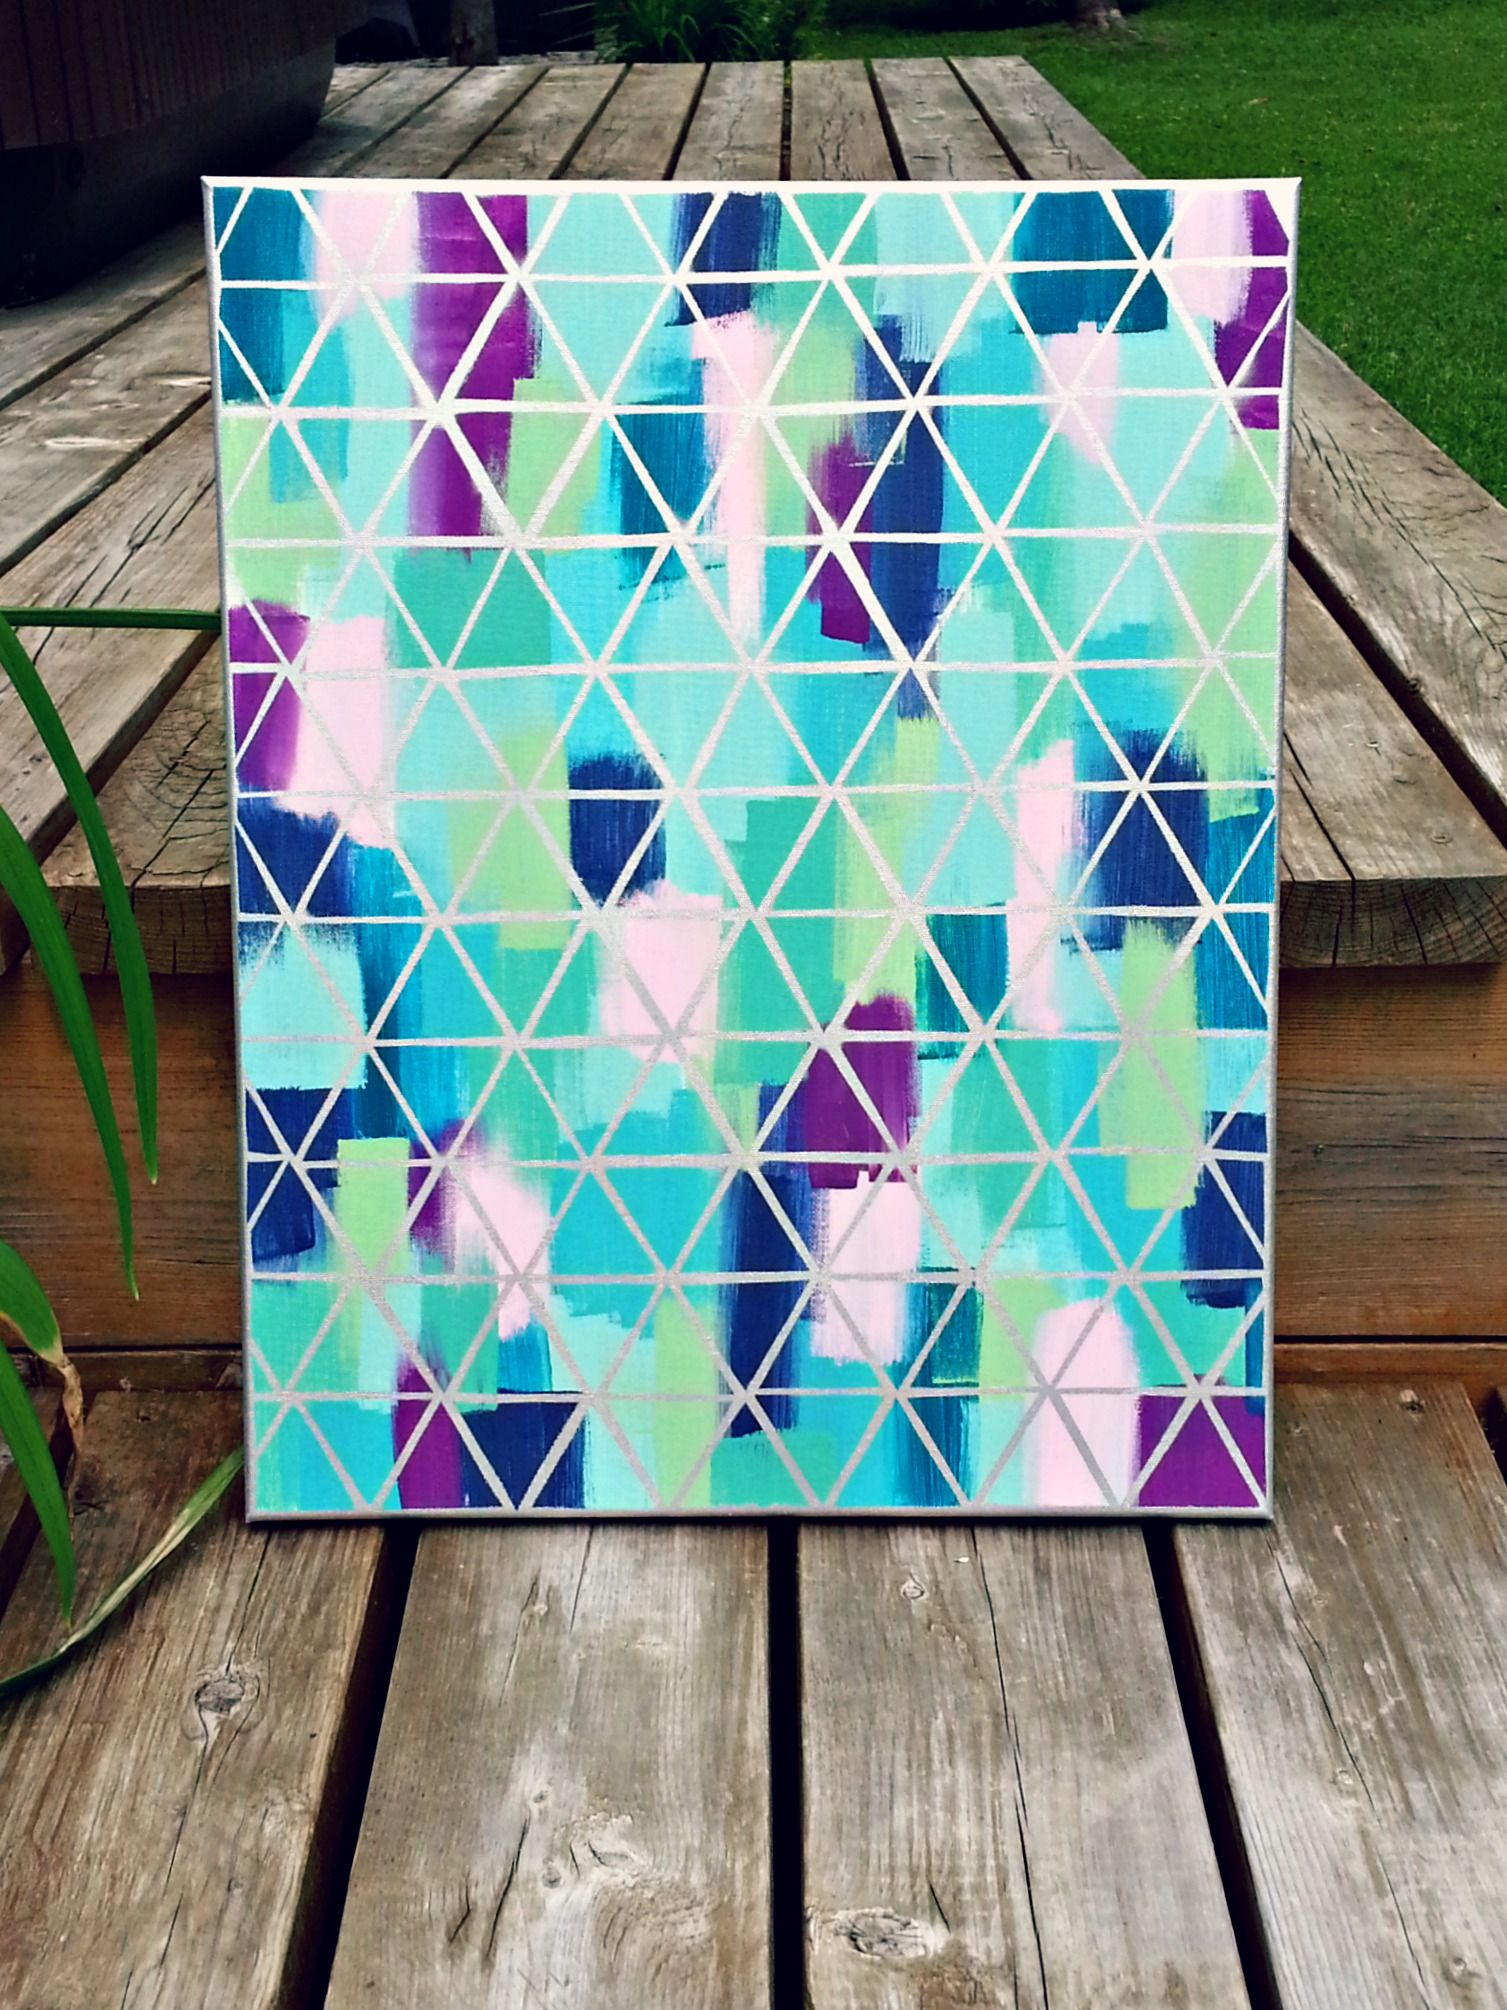 Canvas Painting Using Masking Tape Painters Tape Art Diy Canvas Art Tape Art